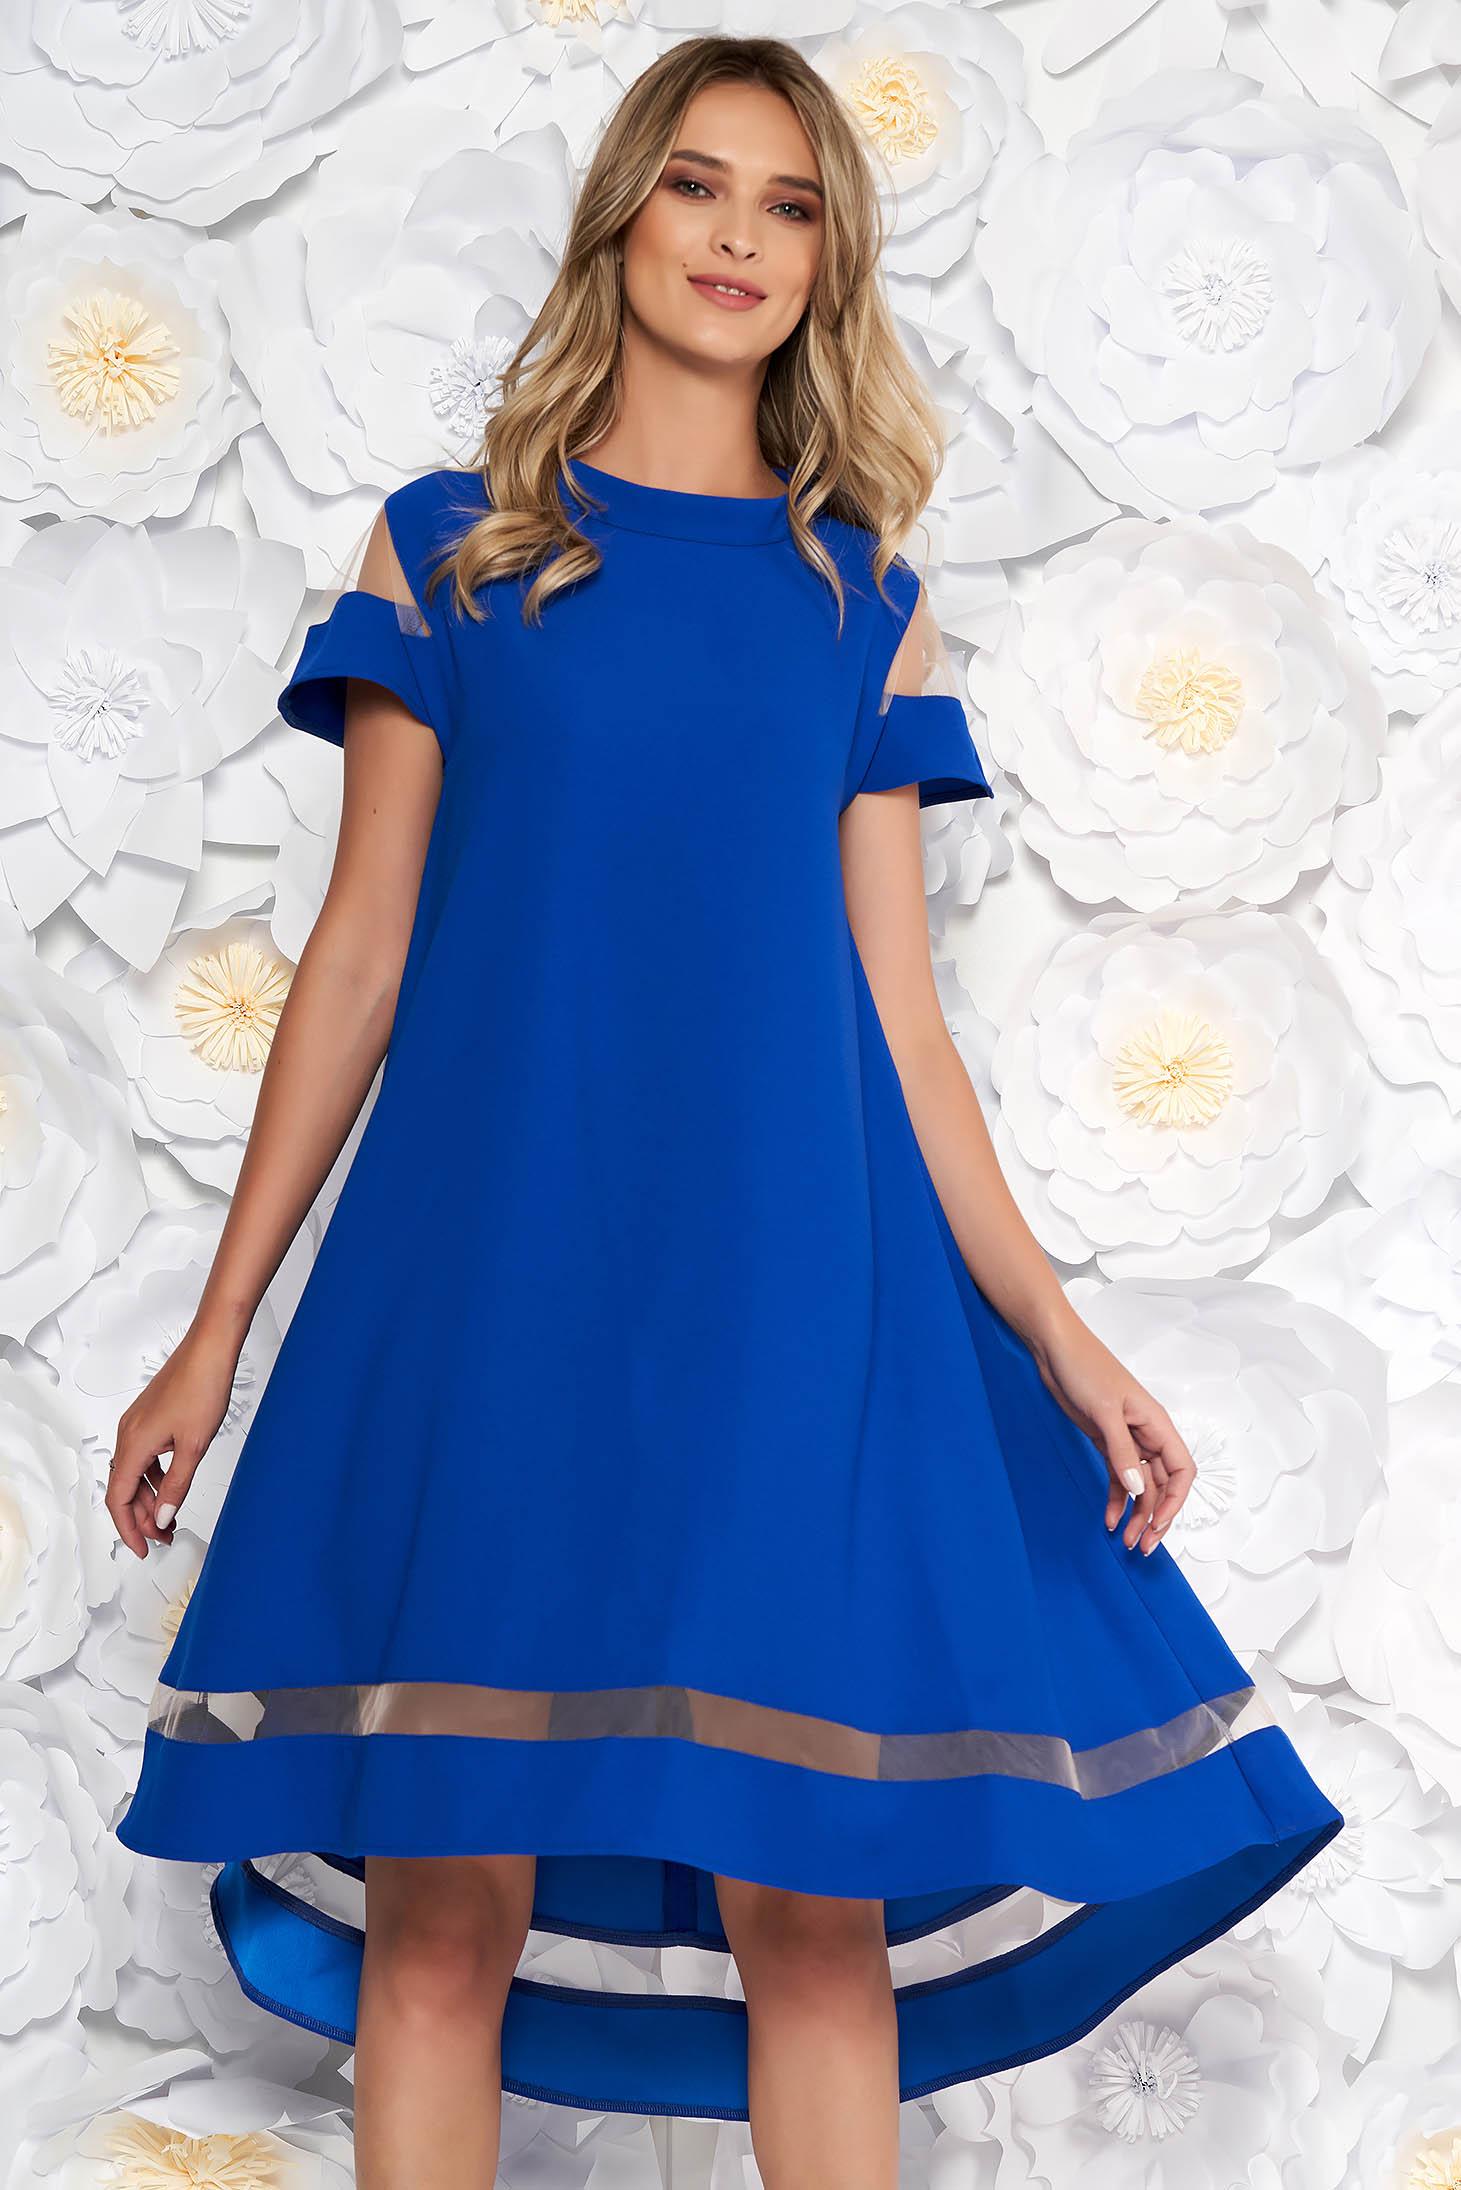 Blue elegant flared asymmetrical dress thin fabric short sleeves